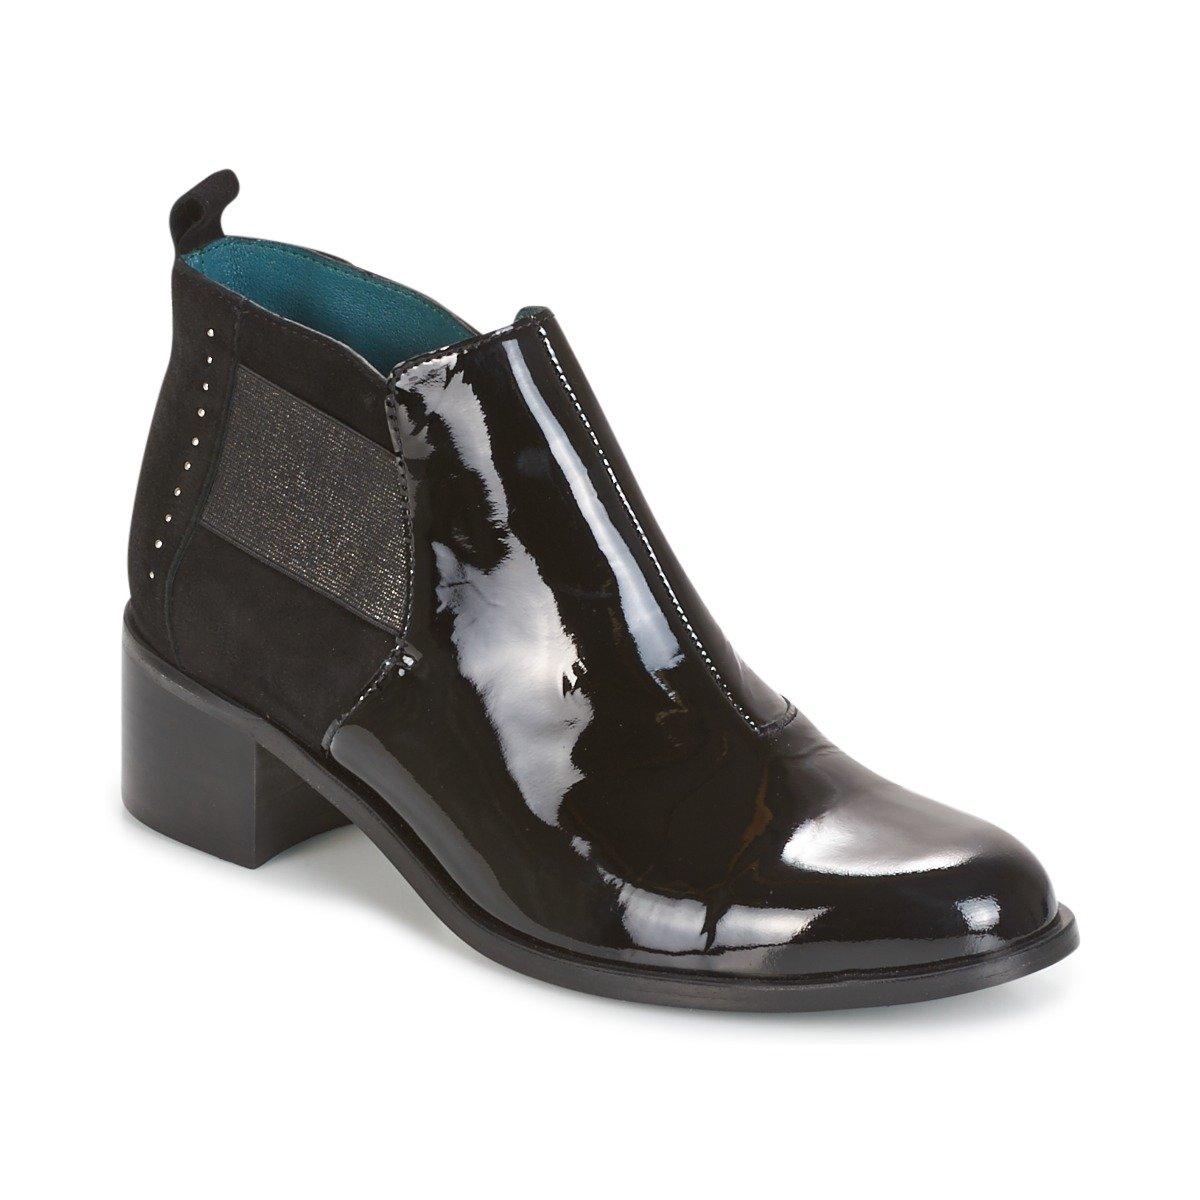 Karston damen GLEBOU Schwarz Ankle Stiefel